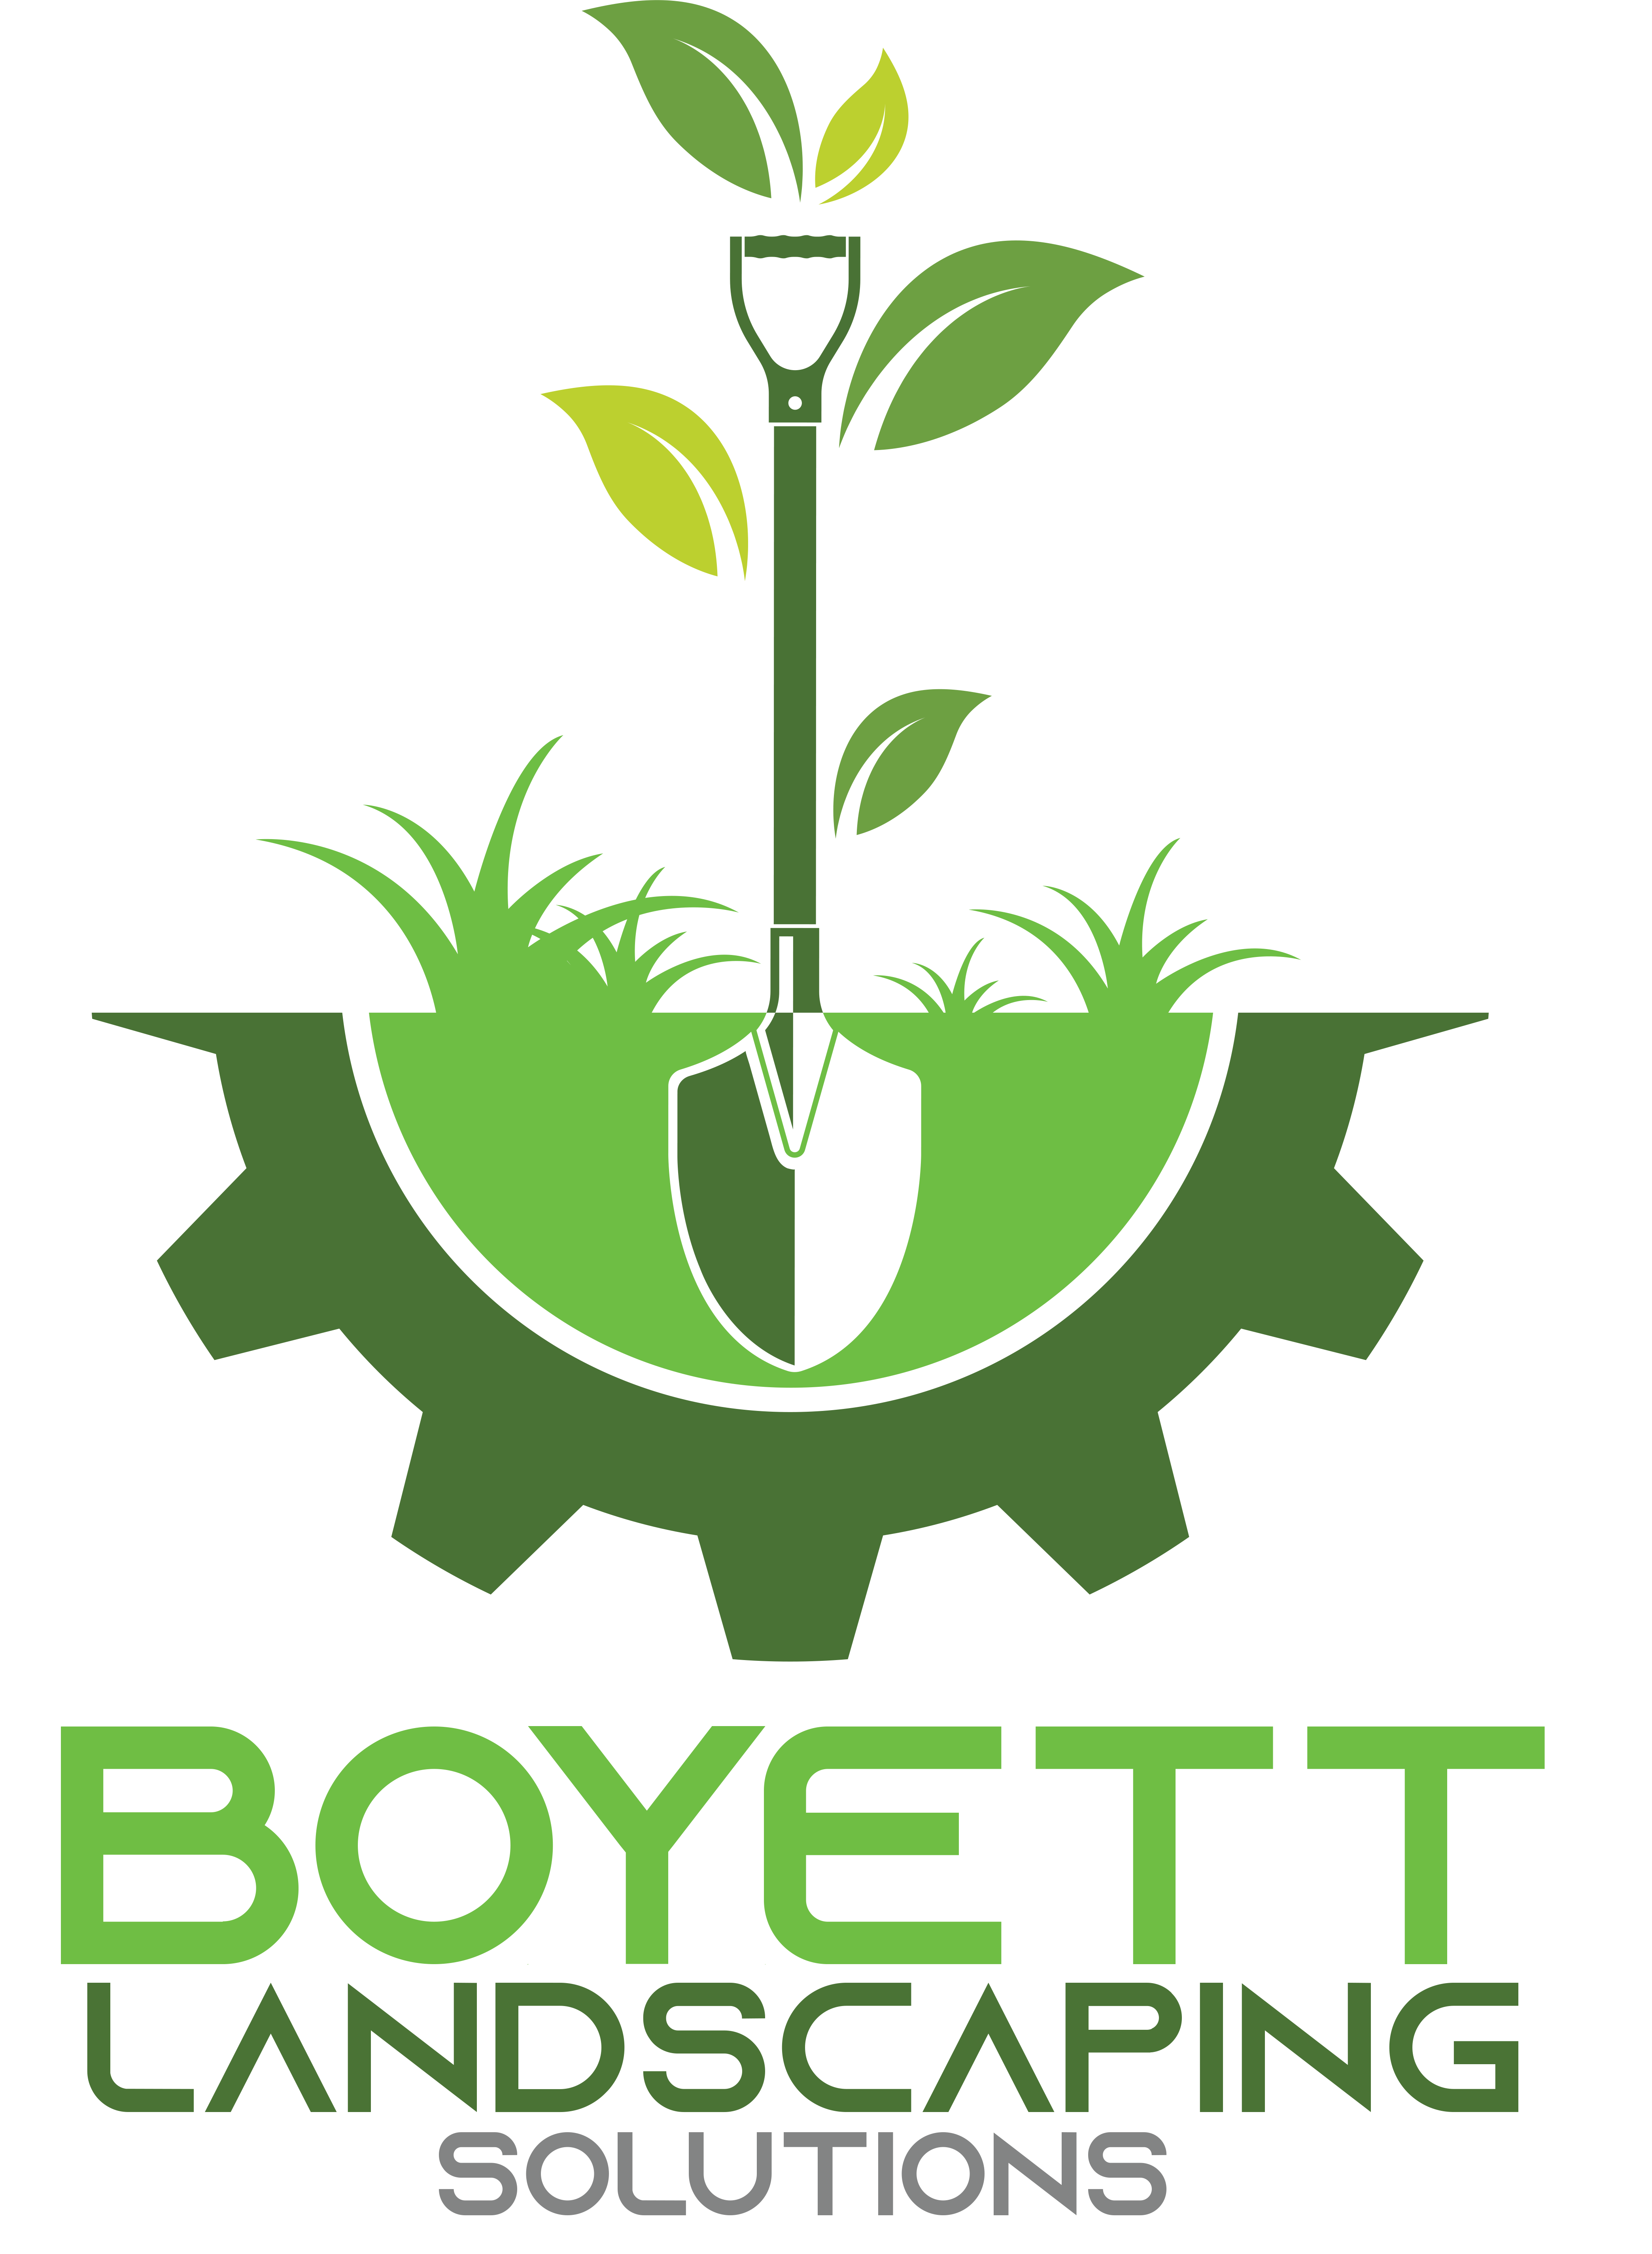 Boyett-Landscaping-Solutions-Logo-002-2-Final